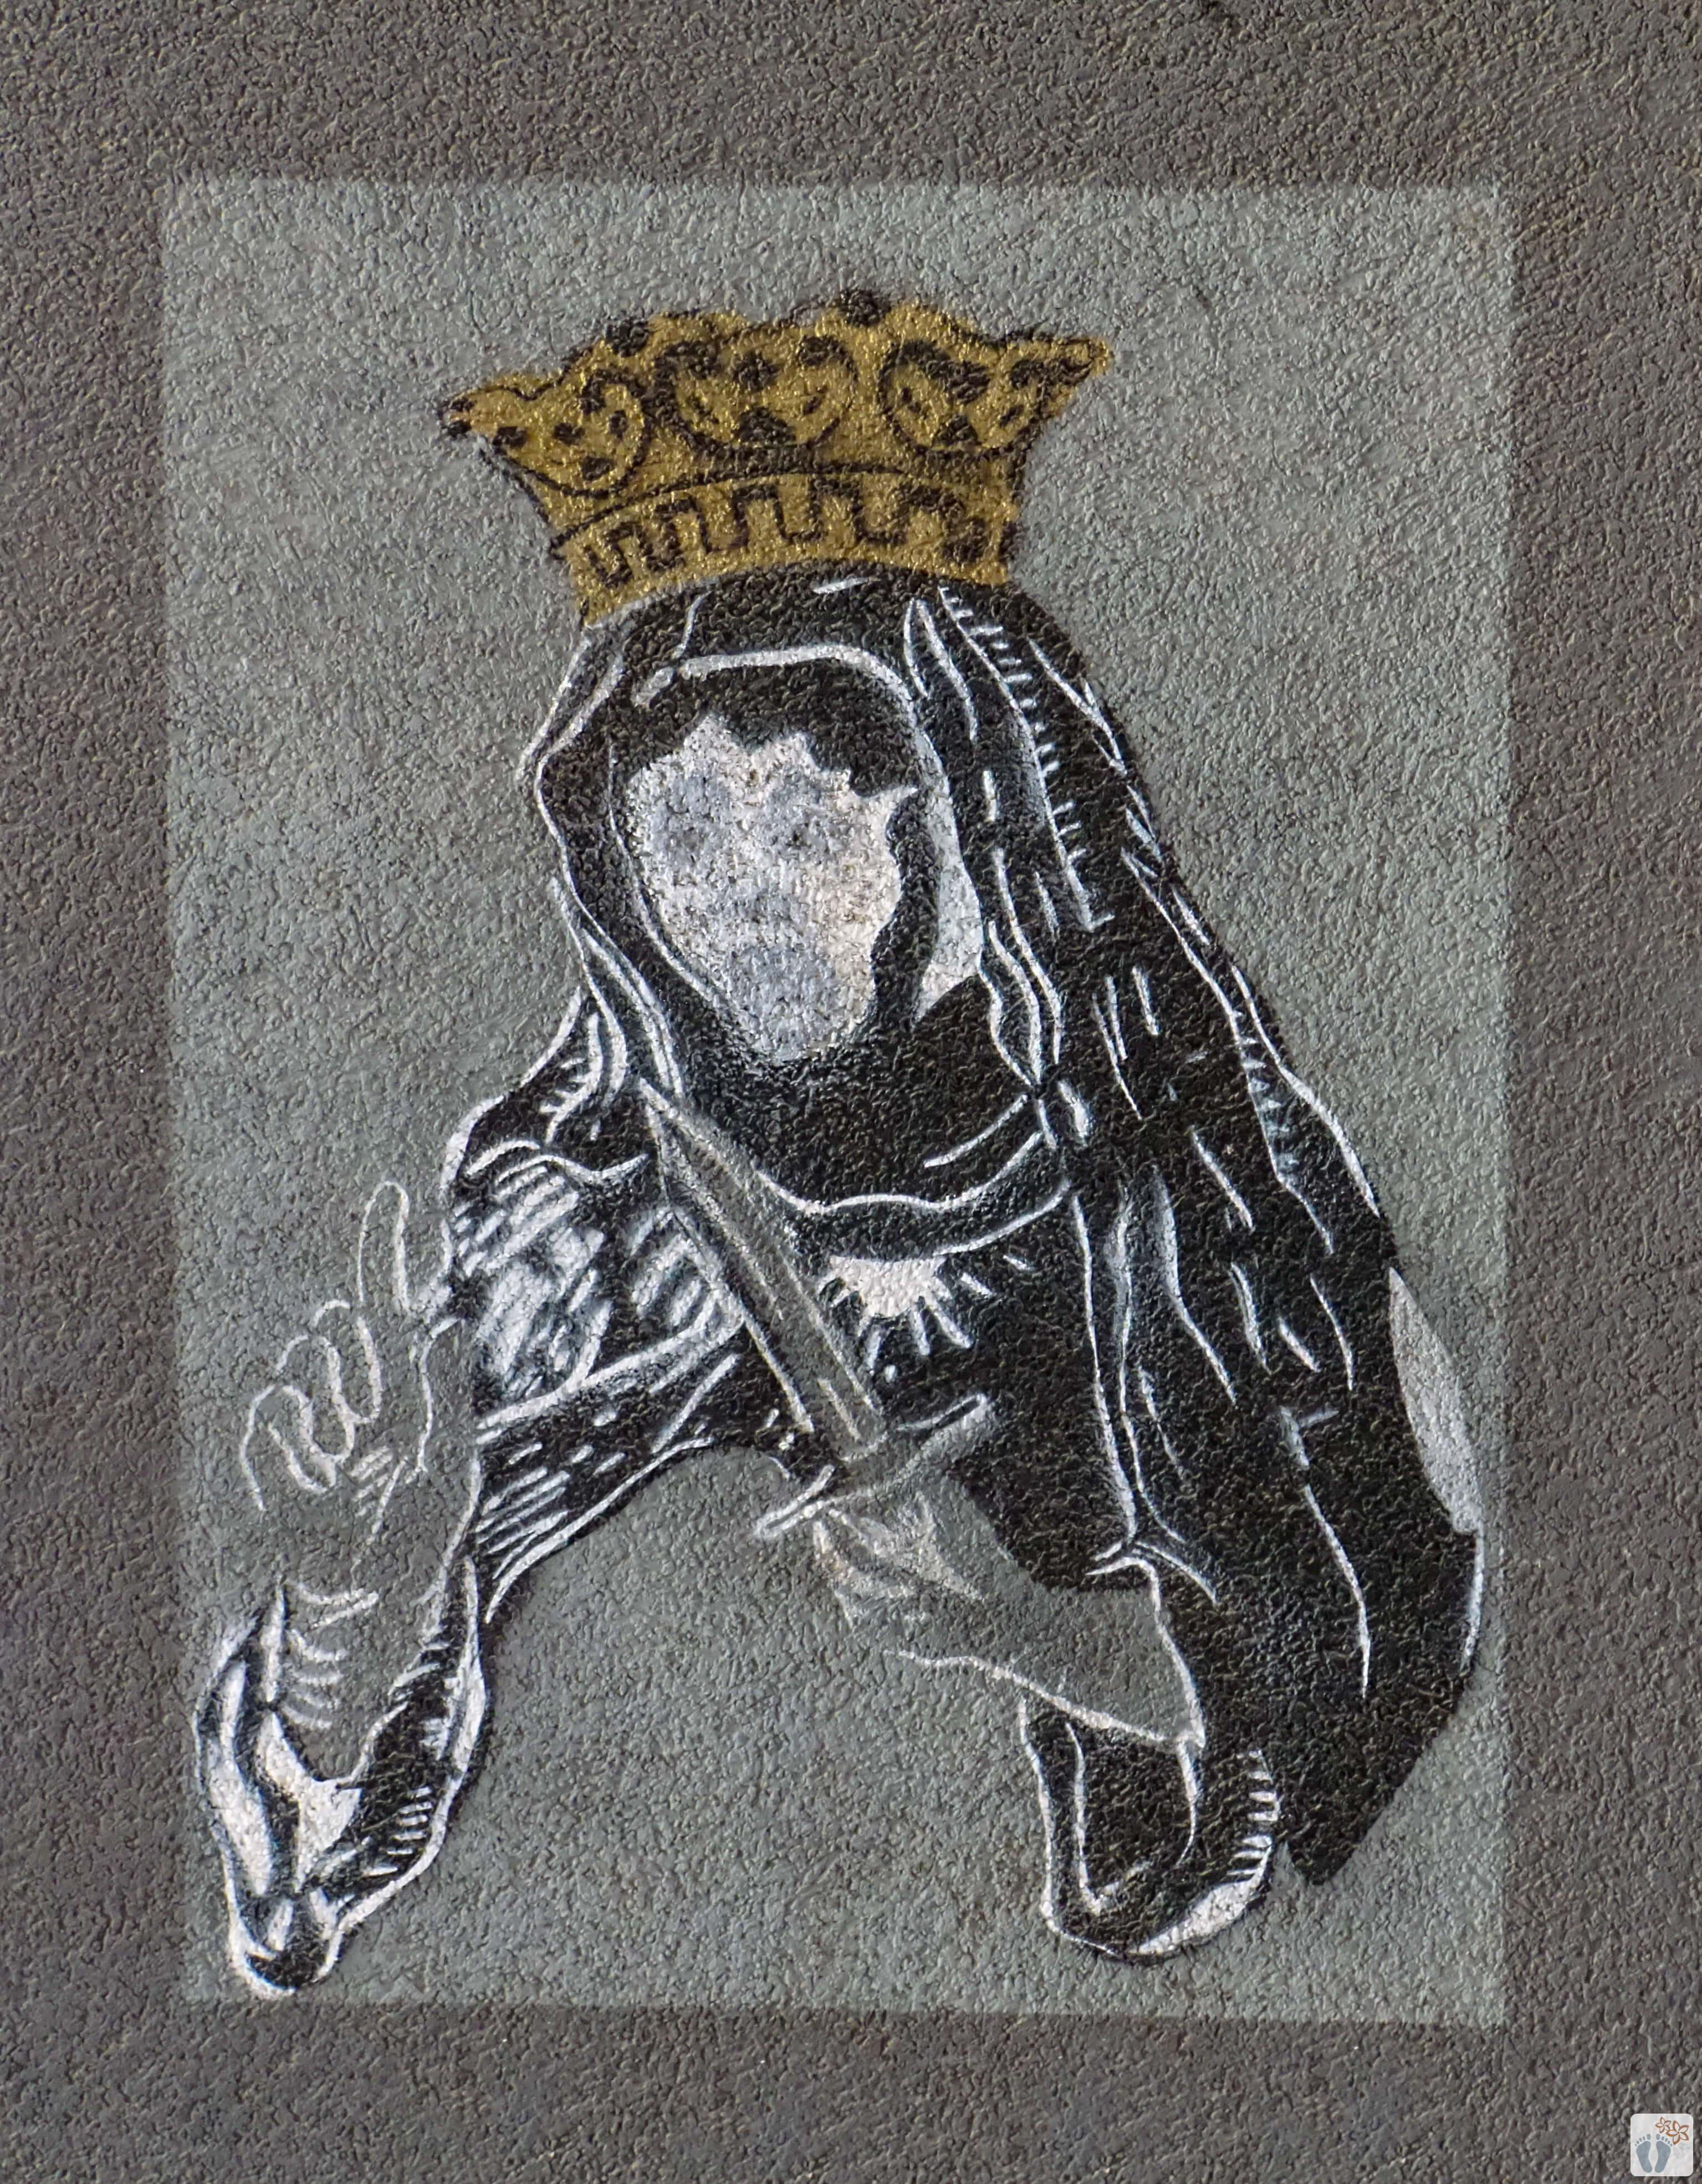 Street-Art #mahnende Königin mit Messer#_Tallinn - Estland